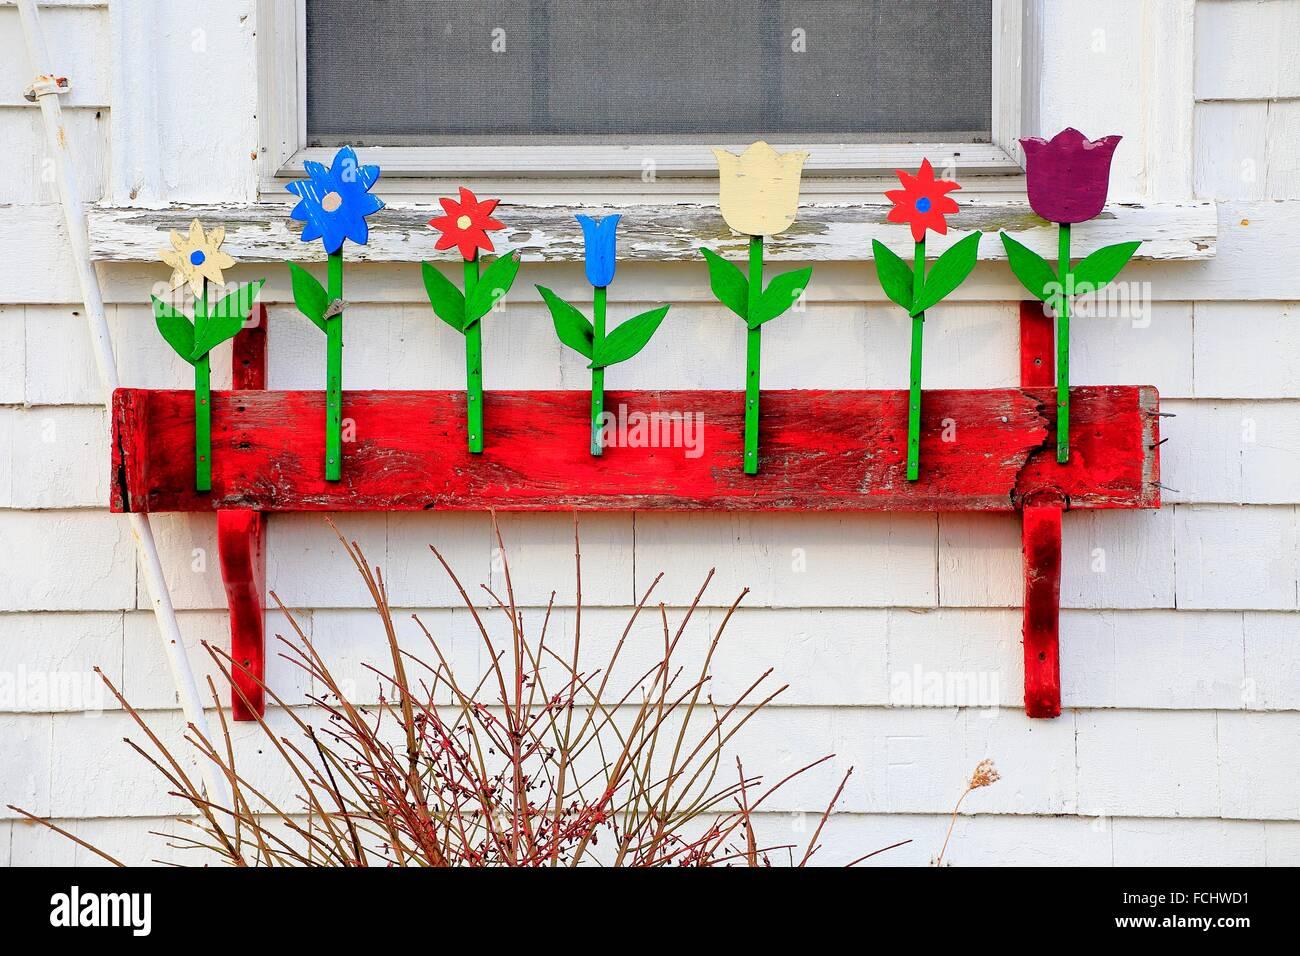 Folk art on a flower box on a community hall in nova scotia, canada - Stock Image